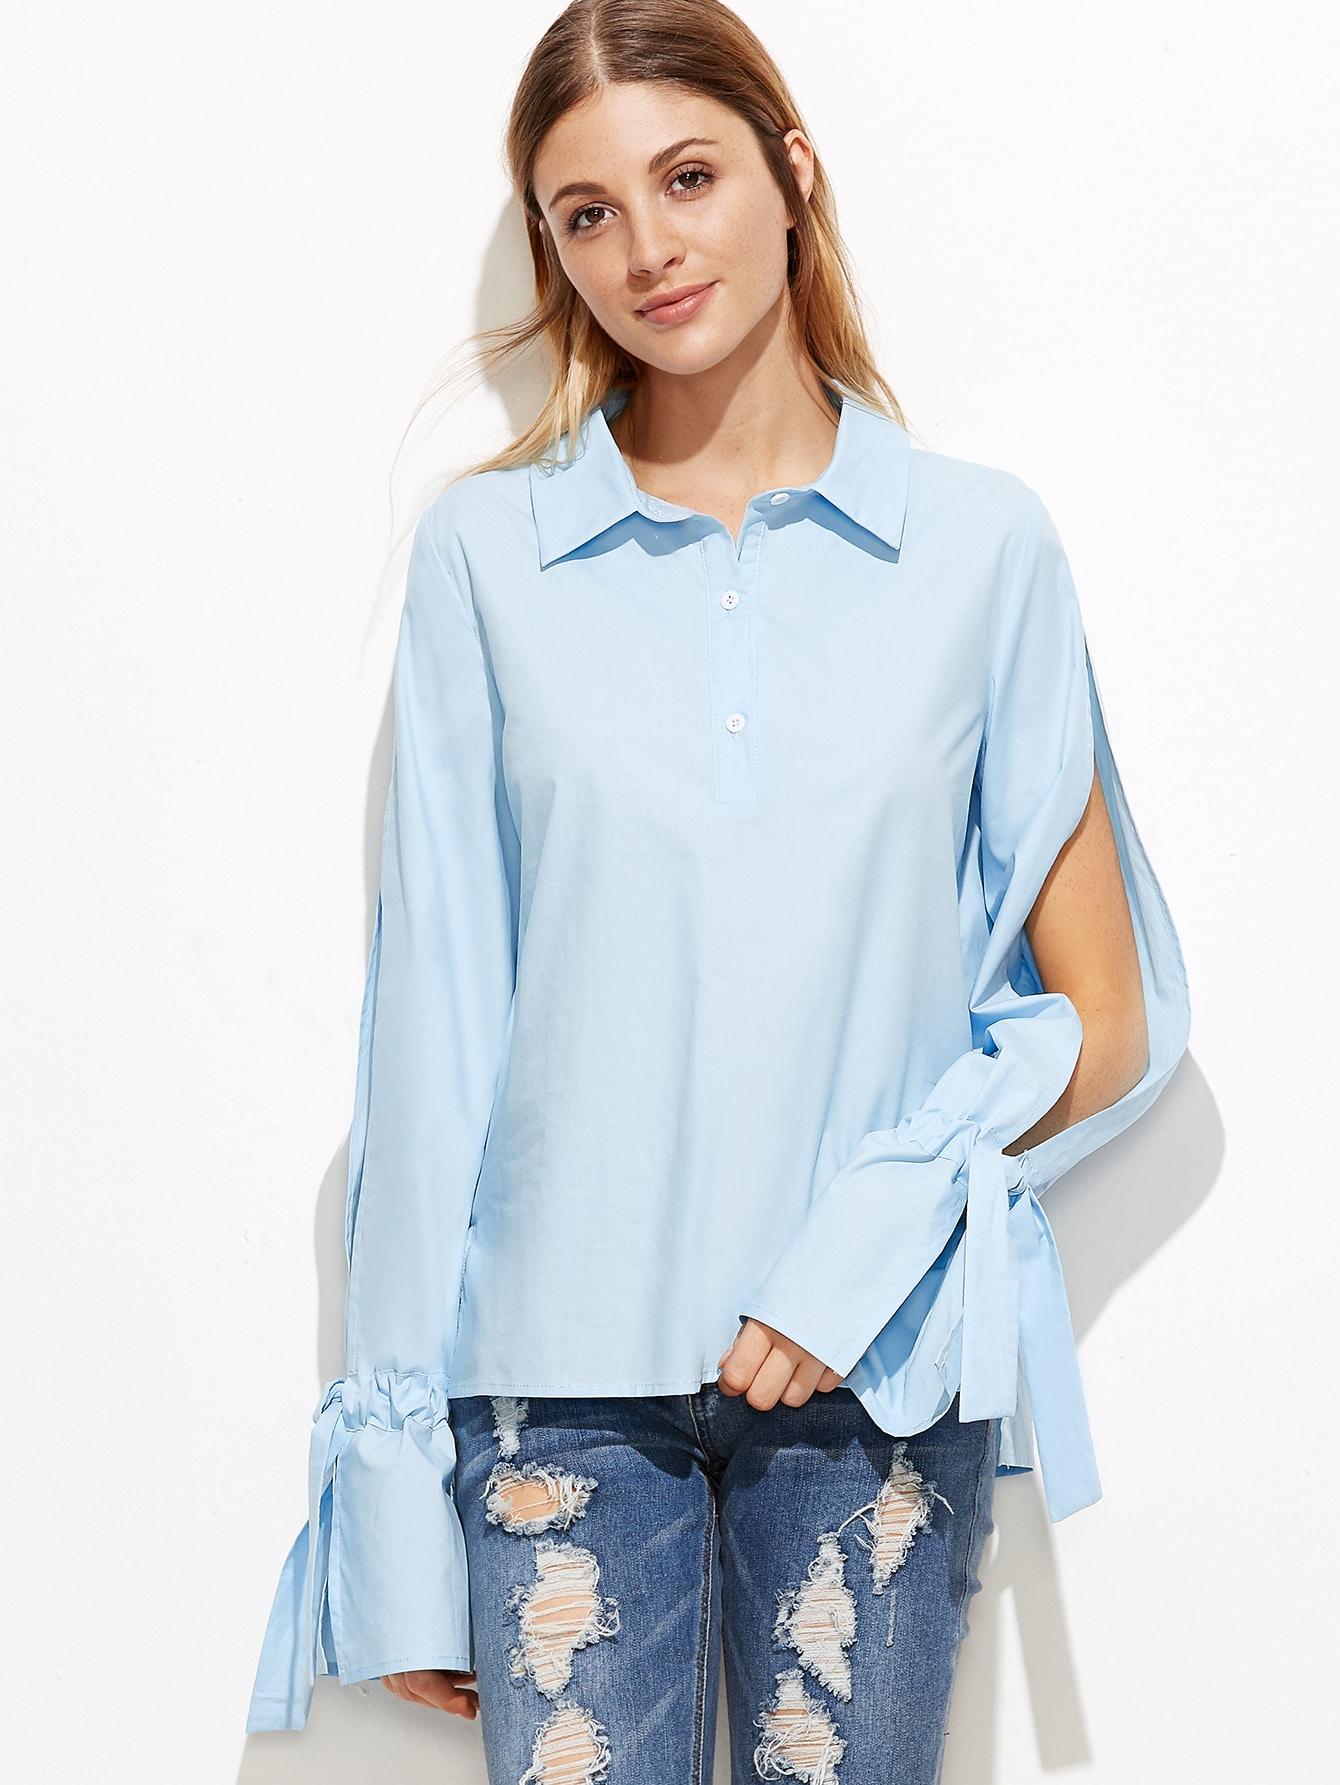 blouse161031701_2